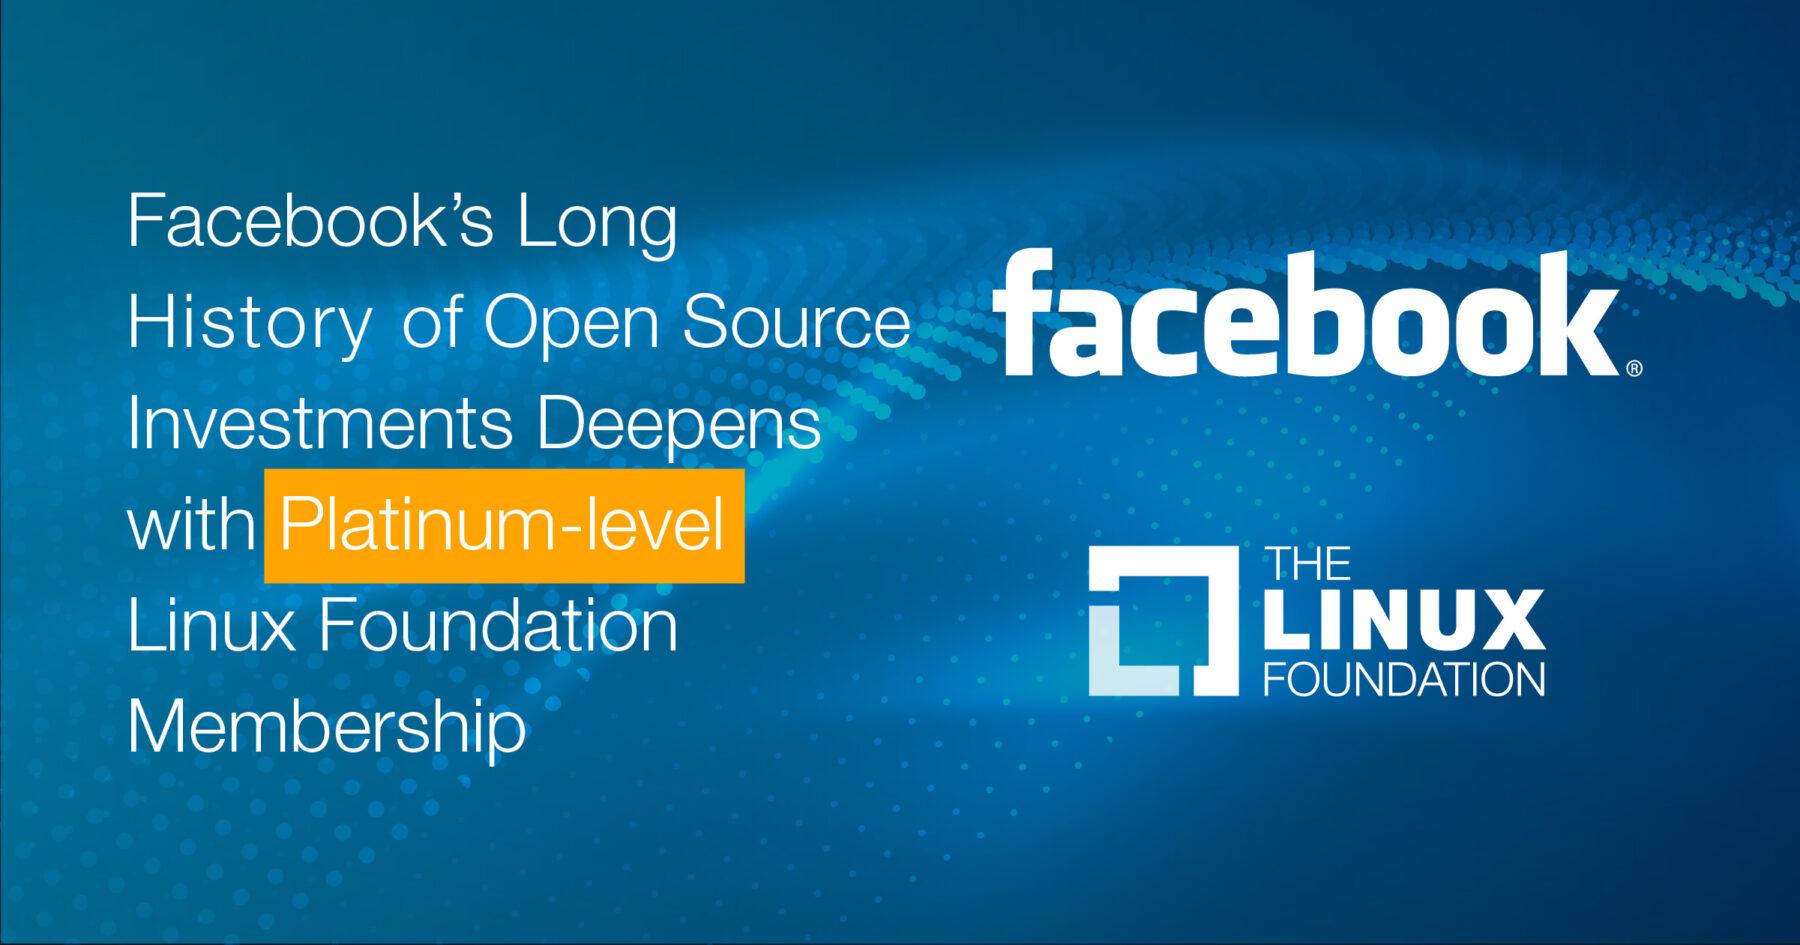 Facebook Becomes Platinum Member